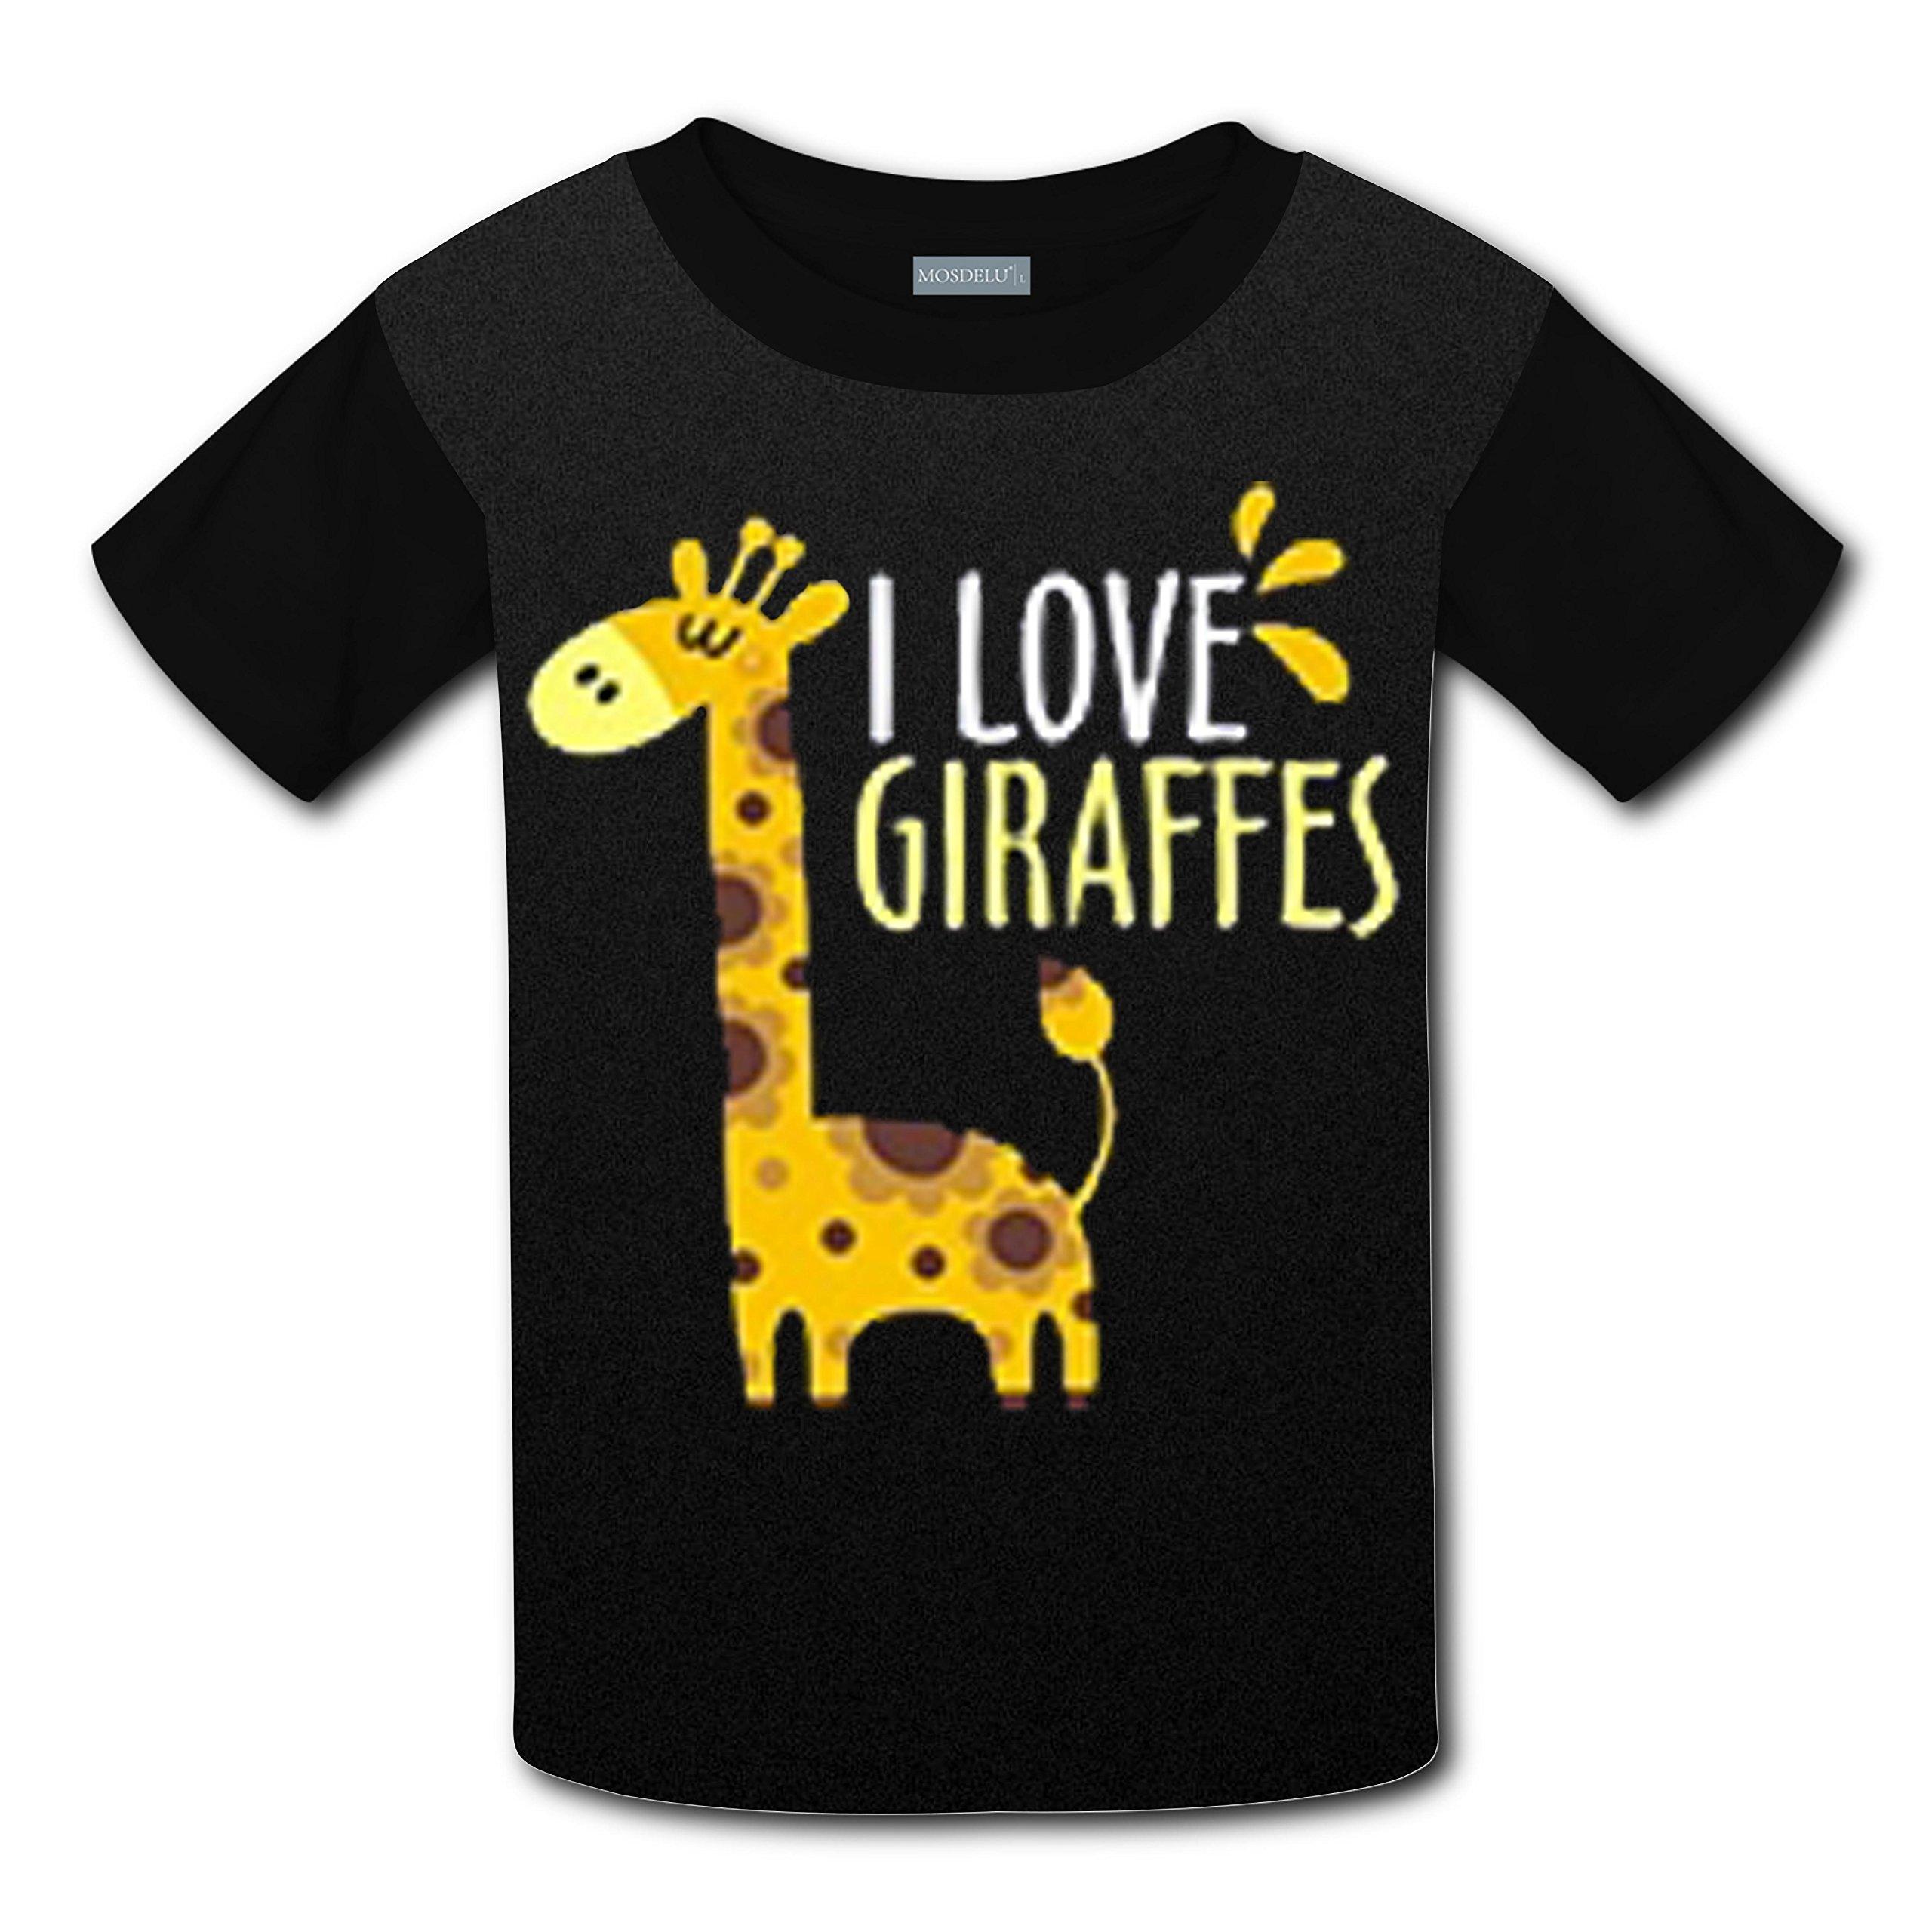 RODONO Unisex Kids I Love Giraffe 3D Printed Round Collar Short Sleeve T- Shirt